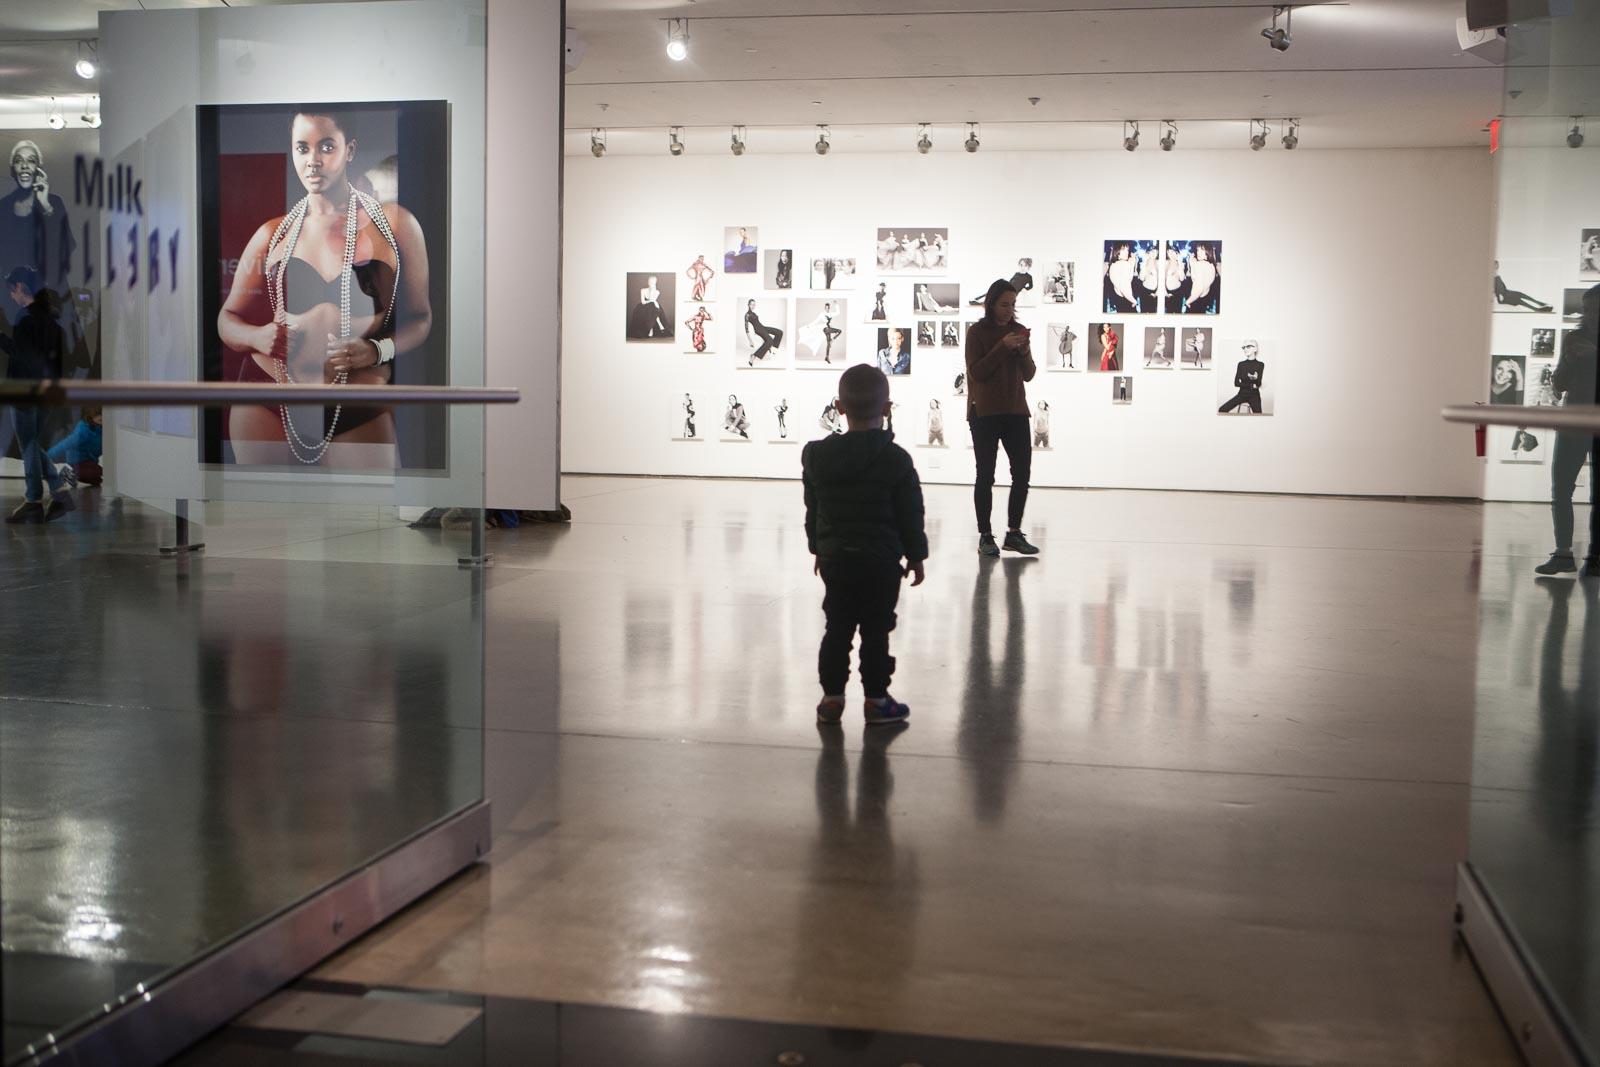 alexi-lubomirski-diverse-beauty-exhibition-robertiaga-5